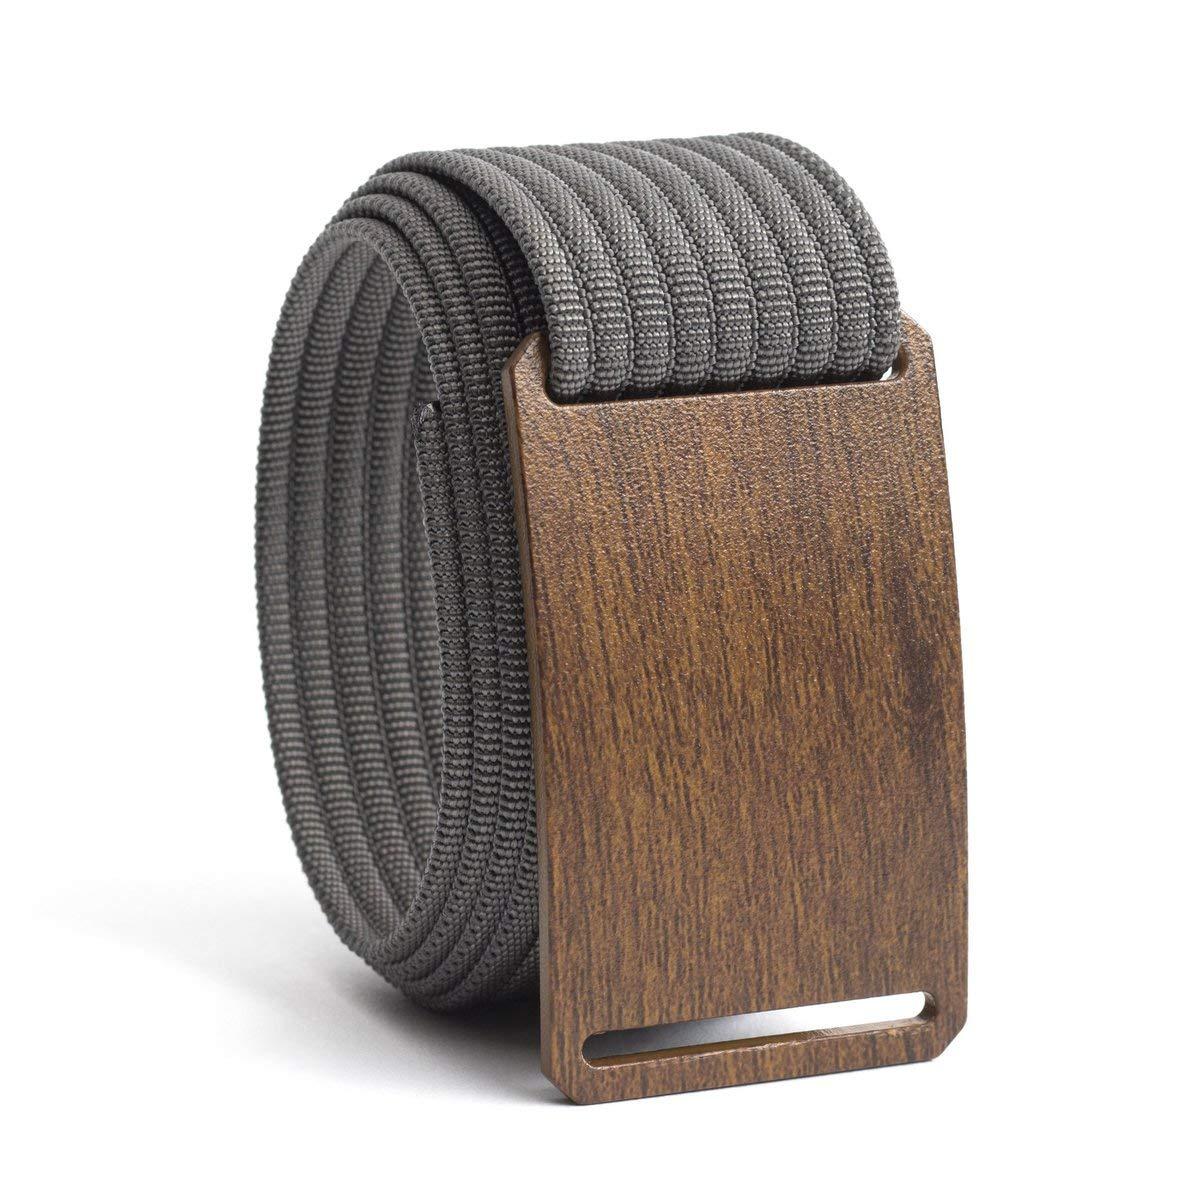 Men's Web Belt GRIP6 Craftsman (38in Walnut w/Grey Strap)